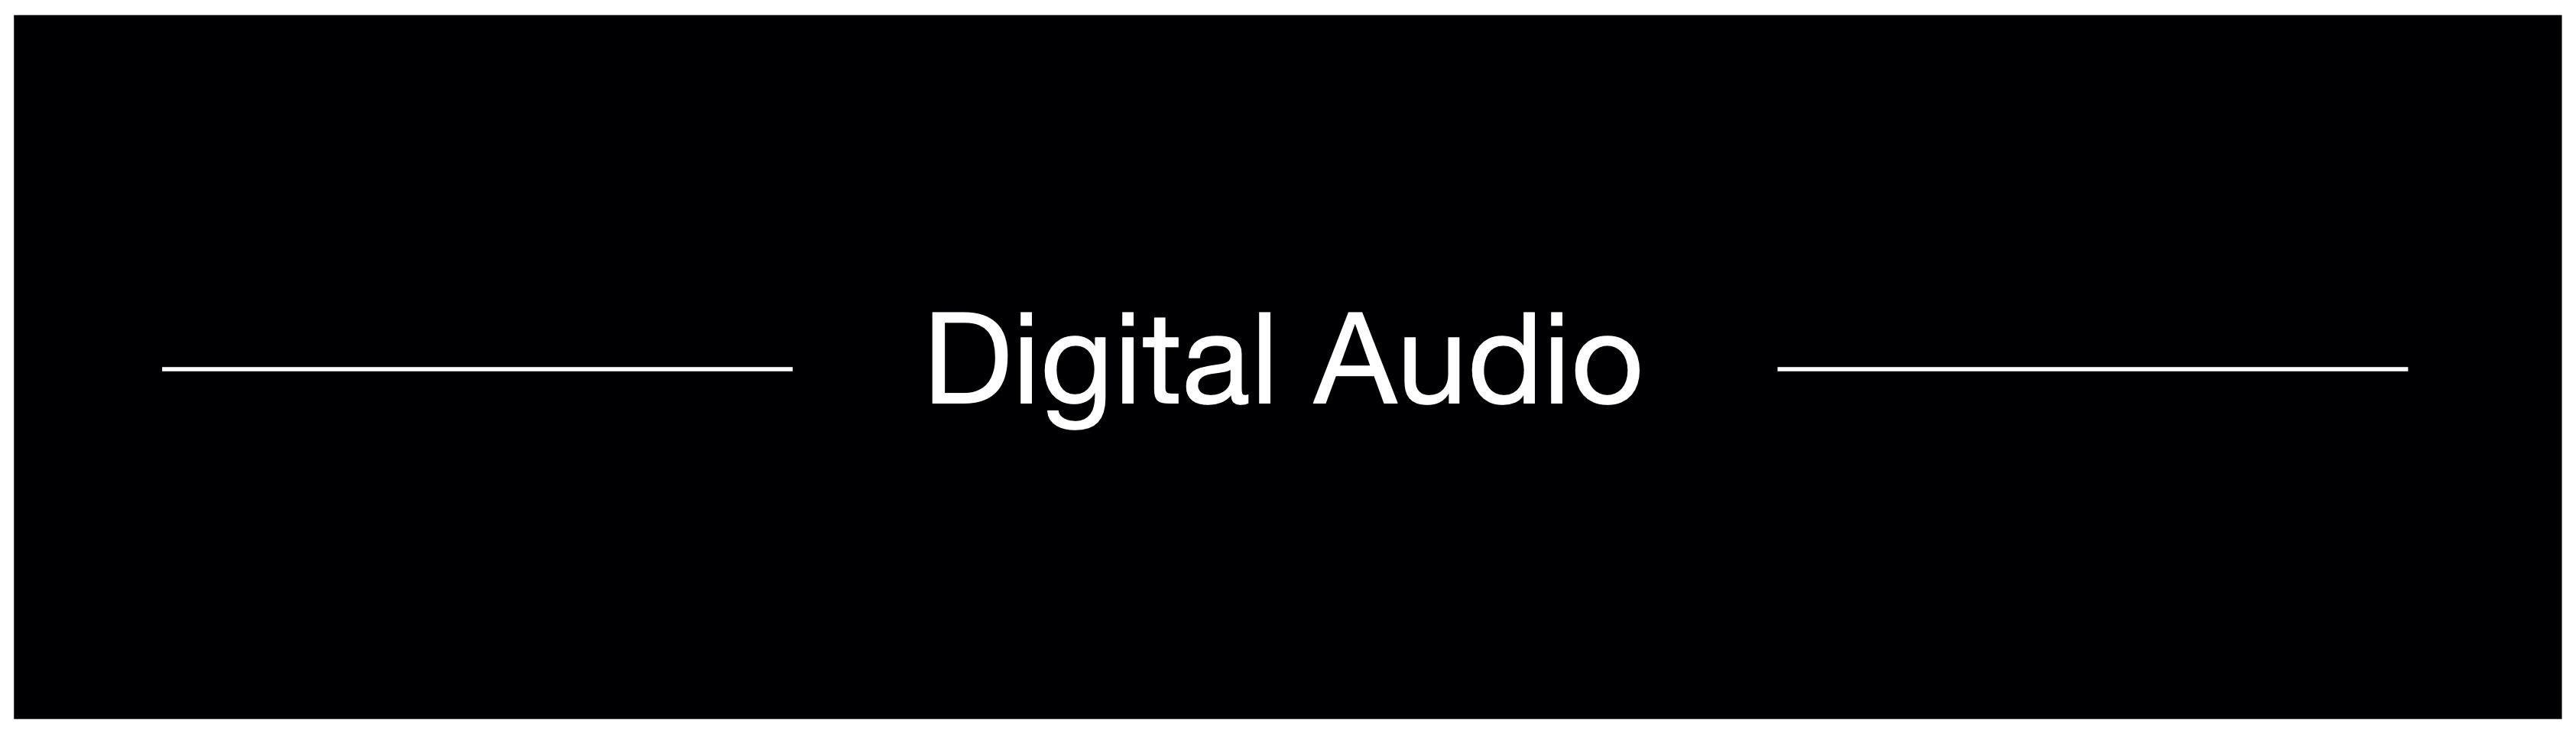 digital-audio-logo.jpg